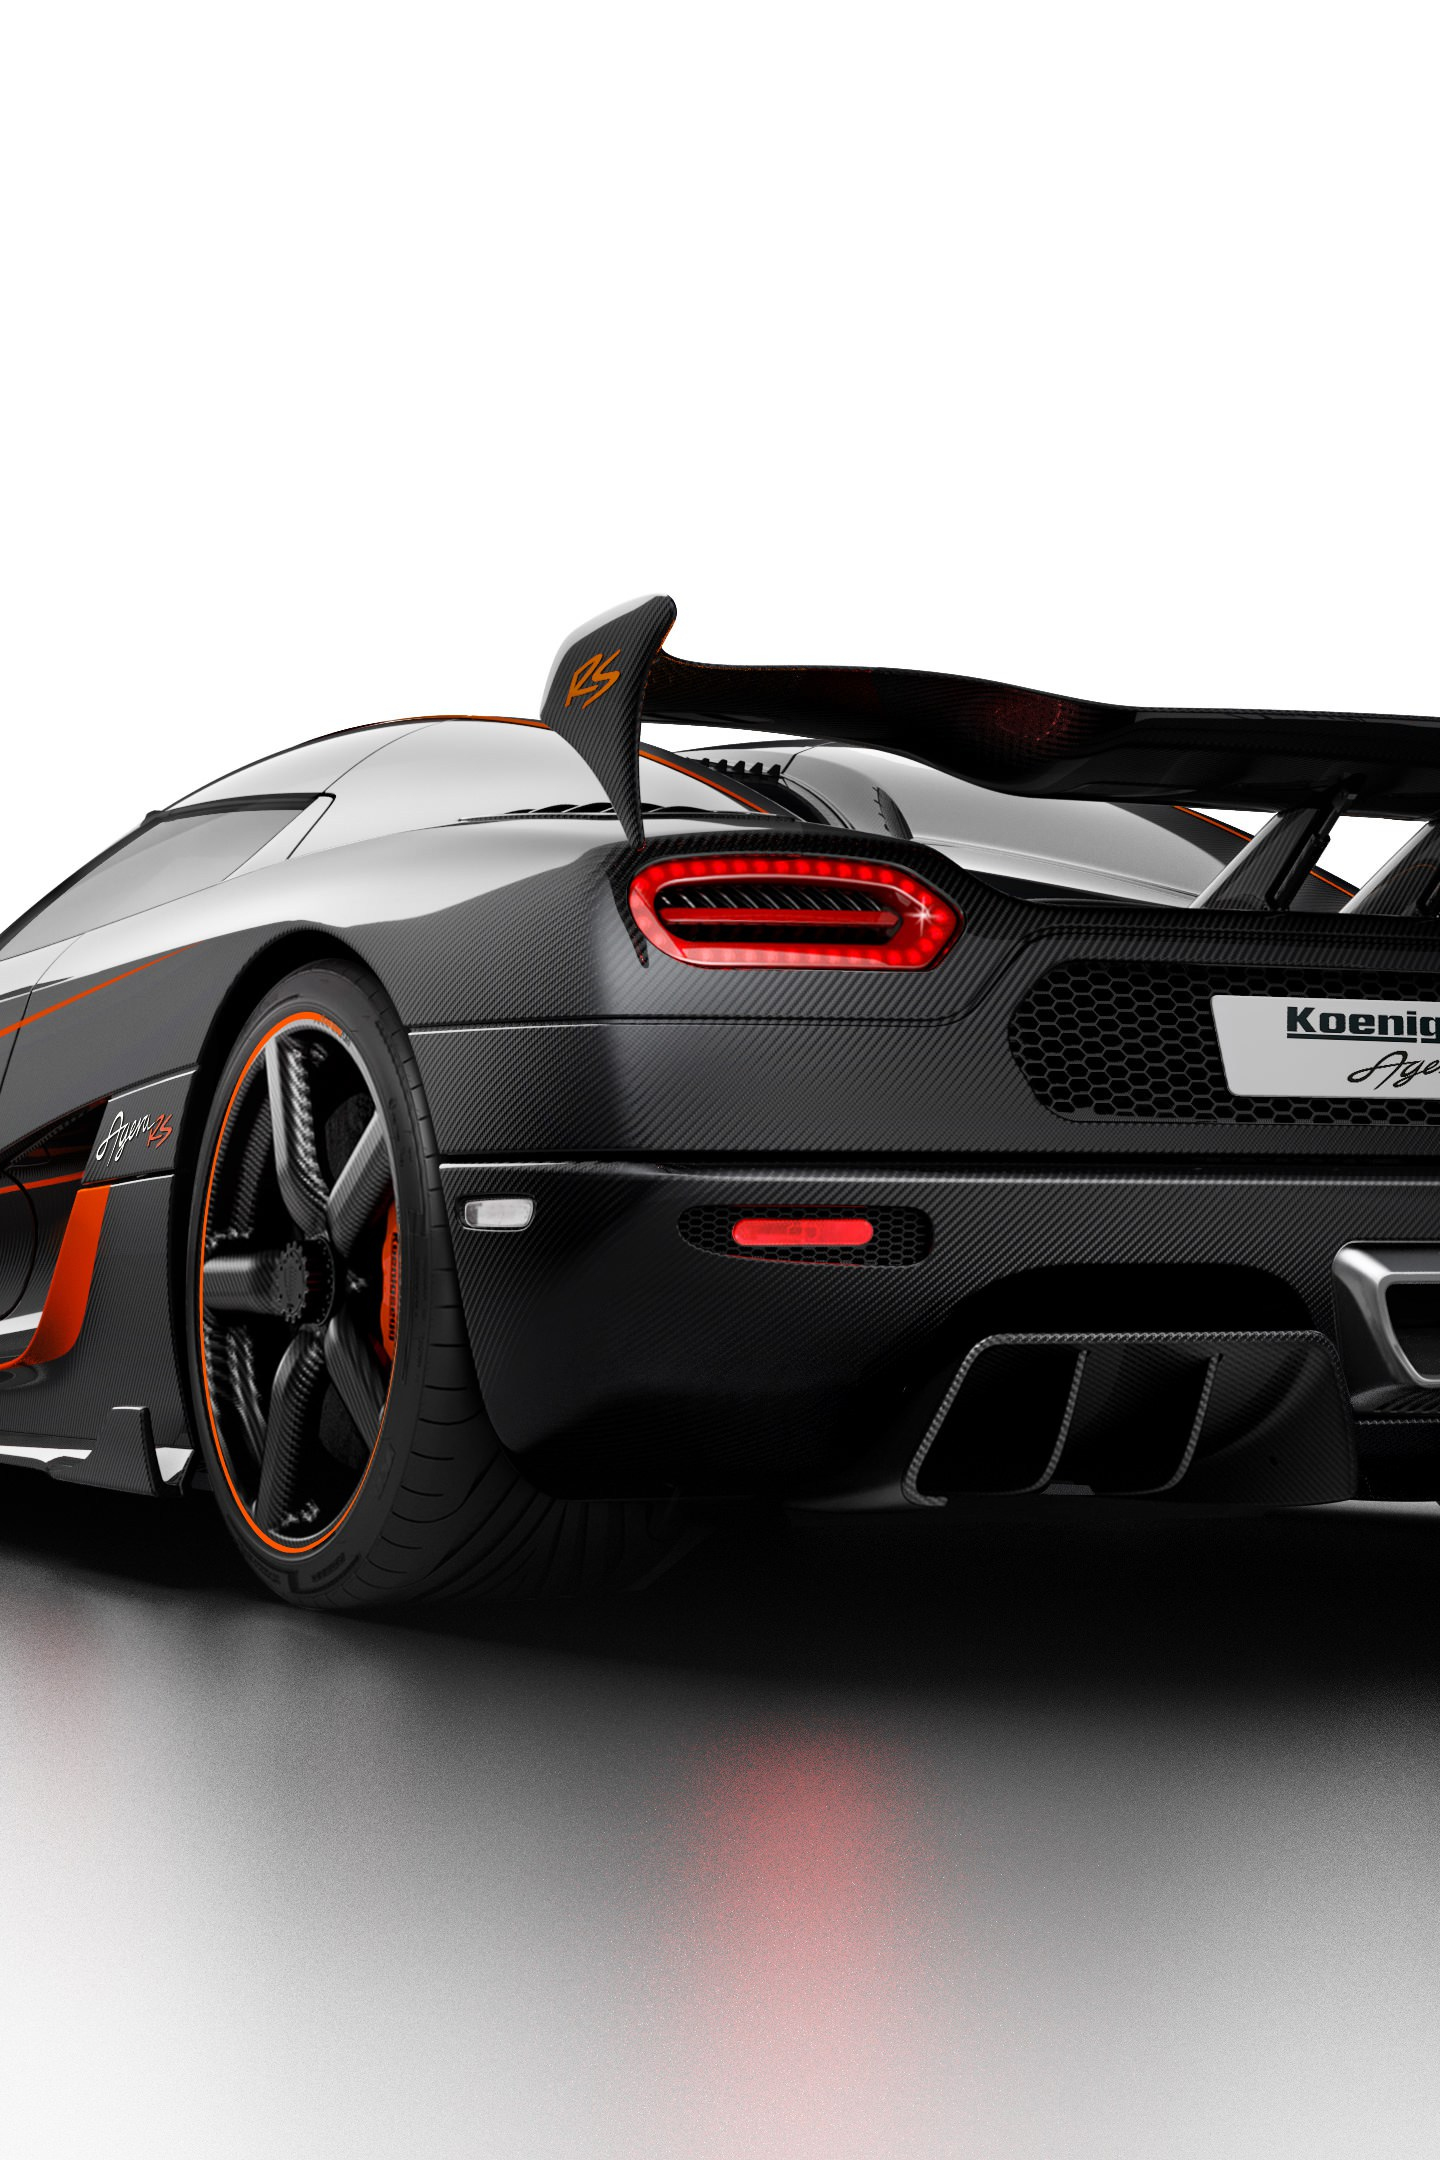 Koenigsegg Agera RS, sports car, rear, 1440x2630 wallpaper